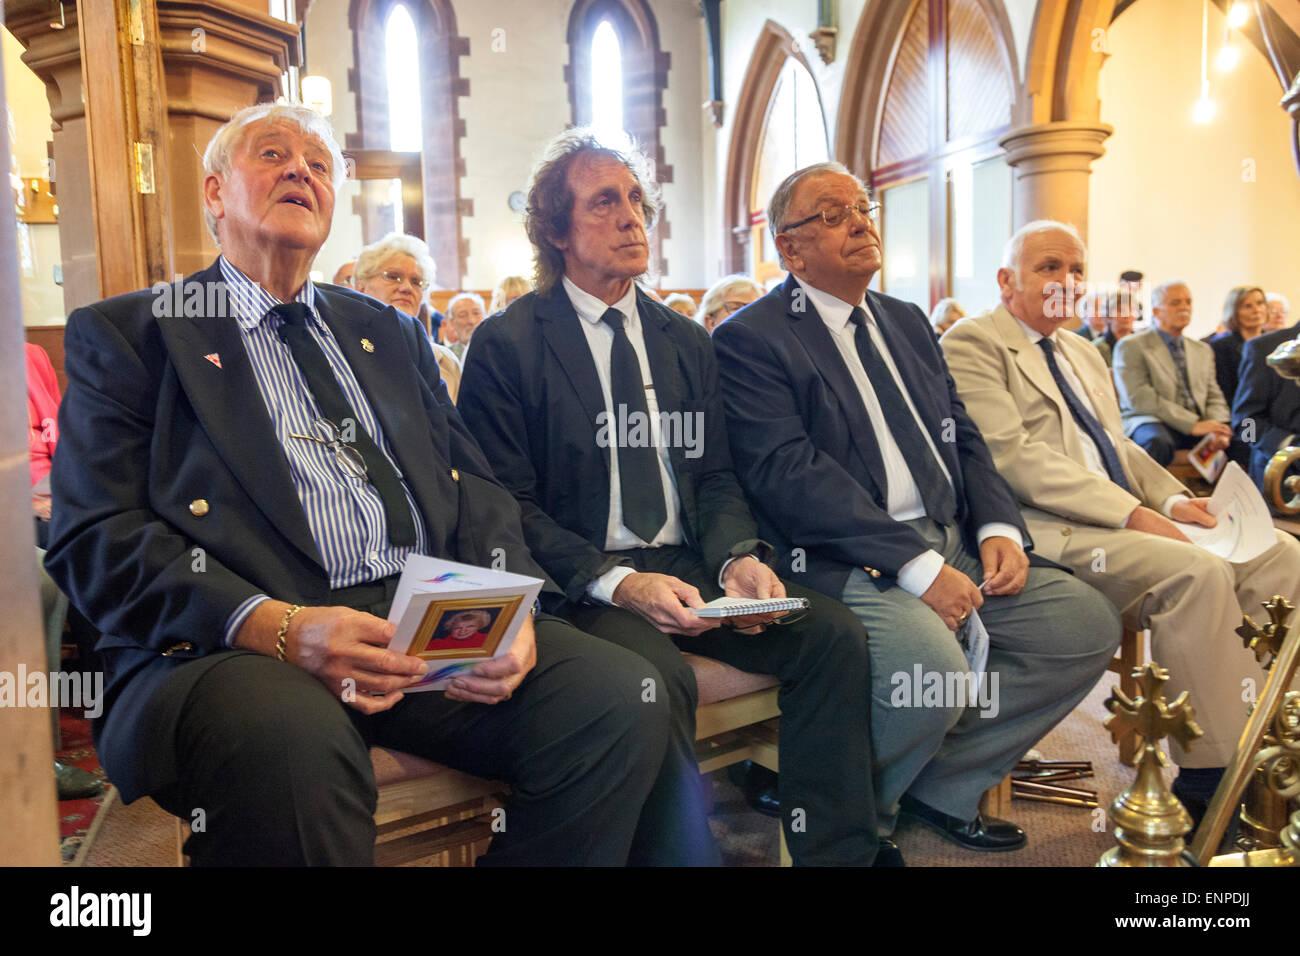 Holy Trinity Church, Chesterton, UK. 8 May 2015. Husband Colin Gregory, Stoke City, Everton and Aston Villa footballer - Stock Image